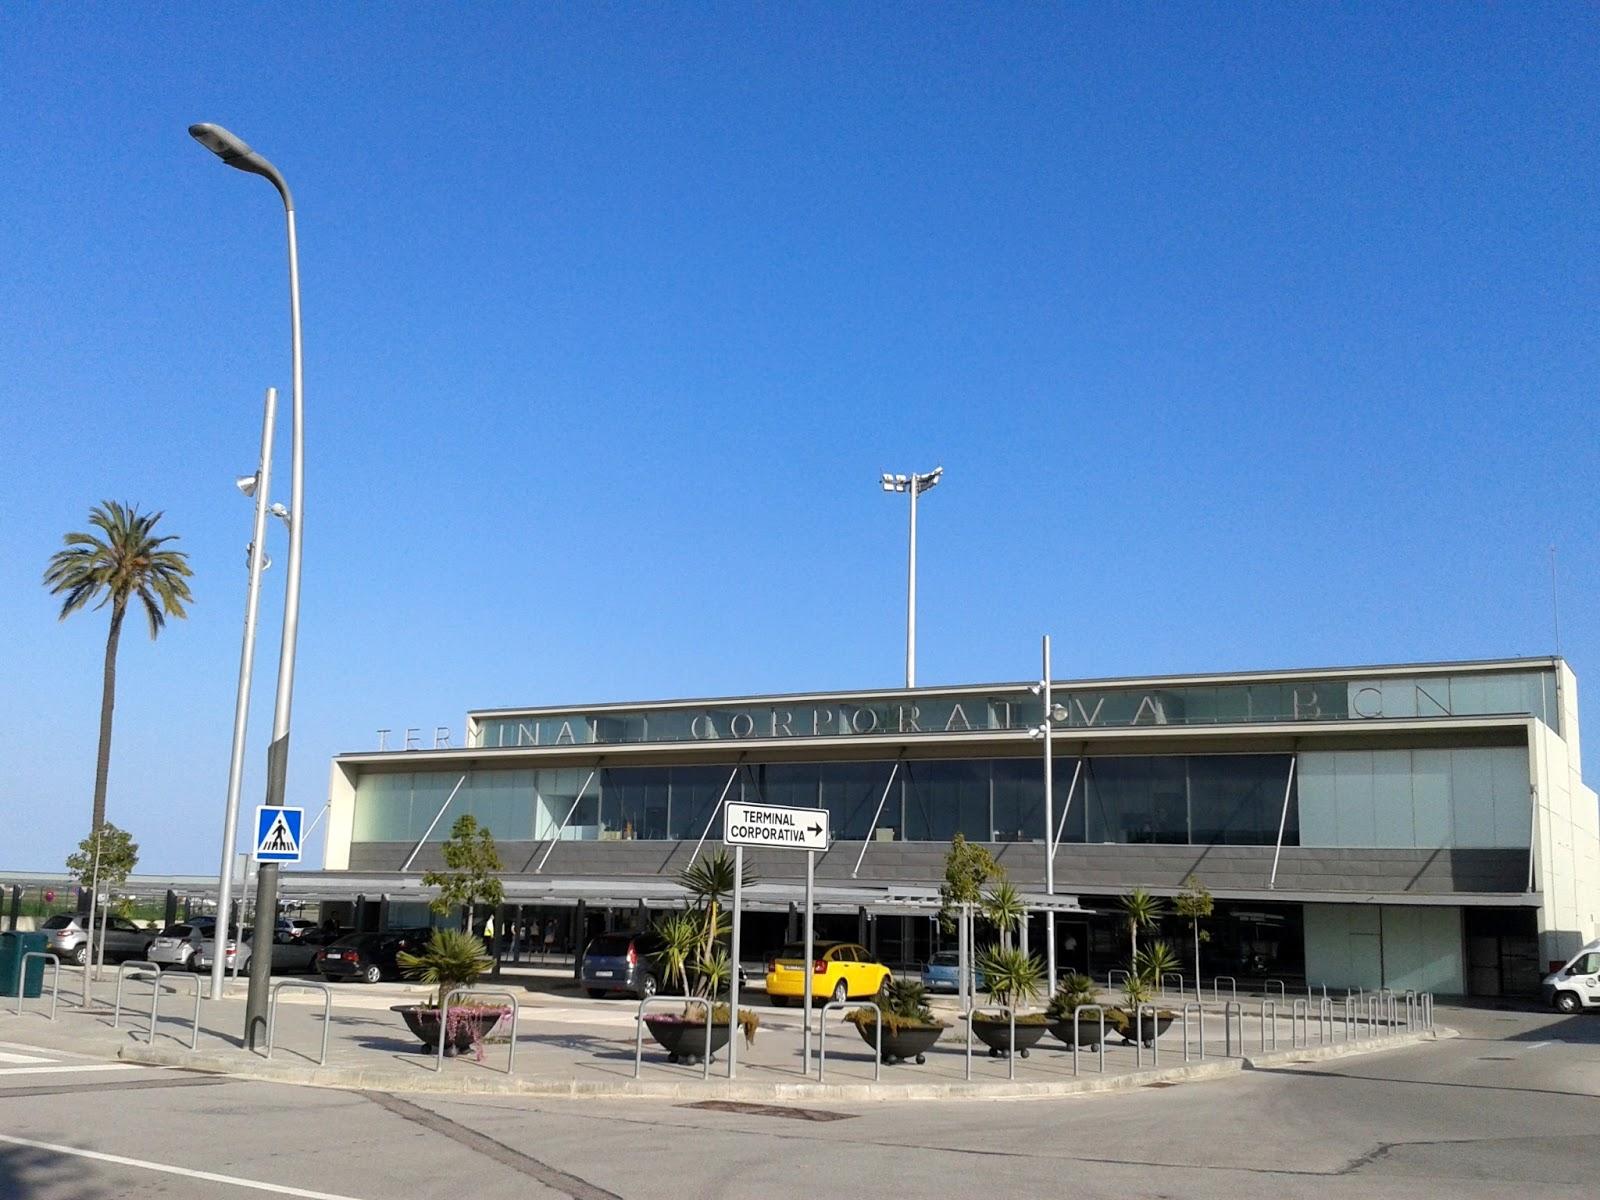 El futuro de la aviaci n ejecutiva blog de javier ortega - Terminal ejecutiva barajas ...